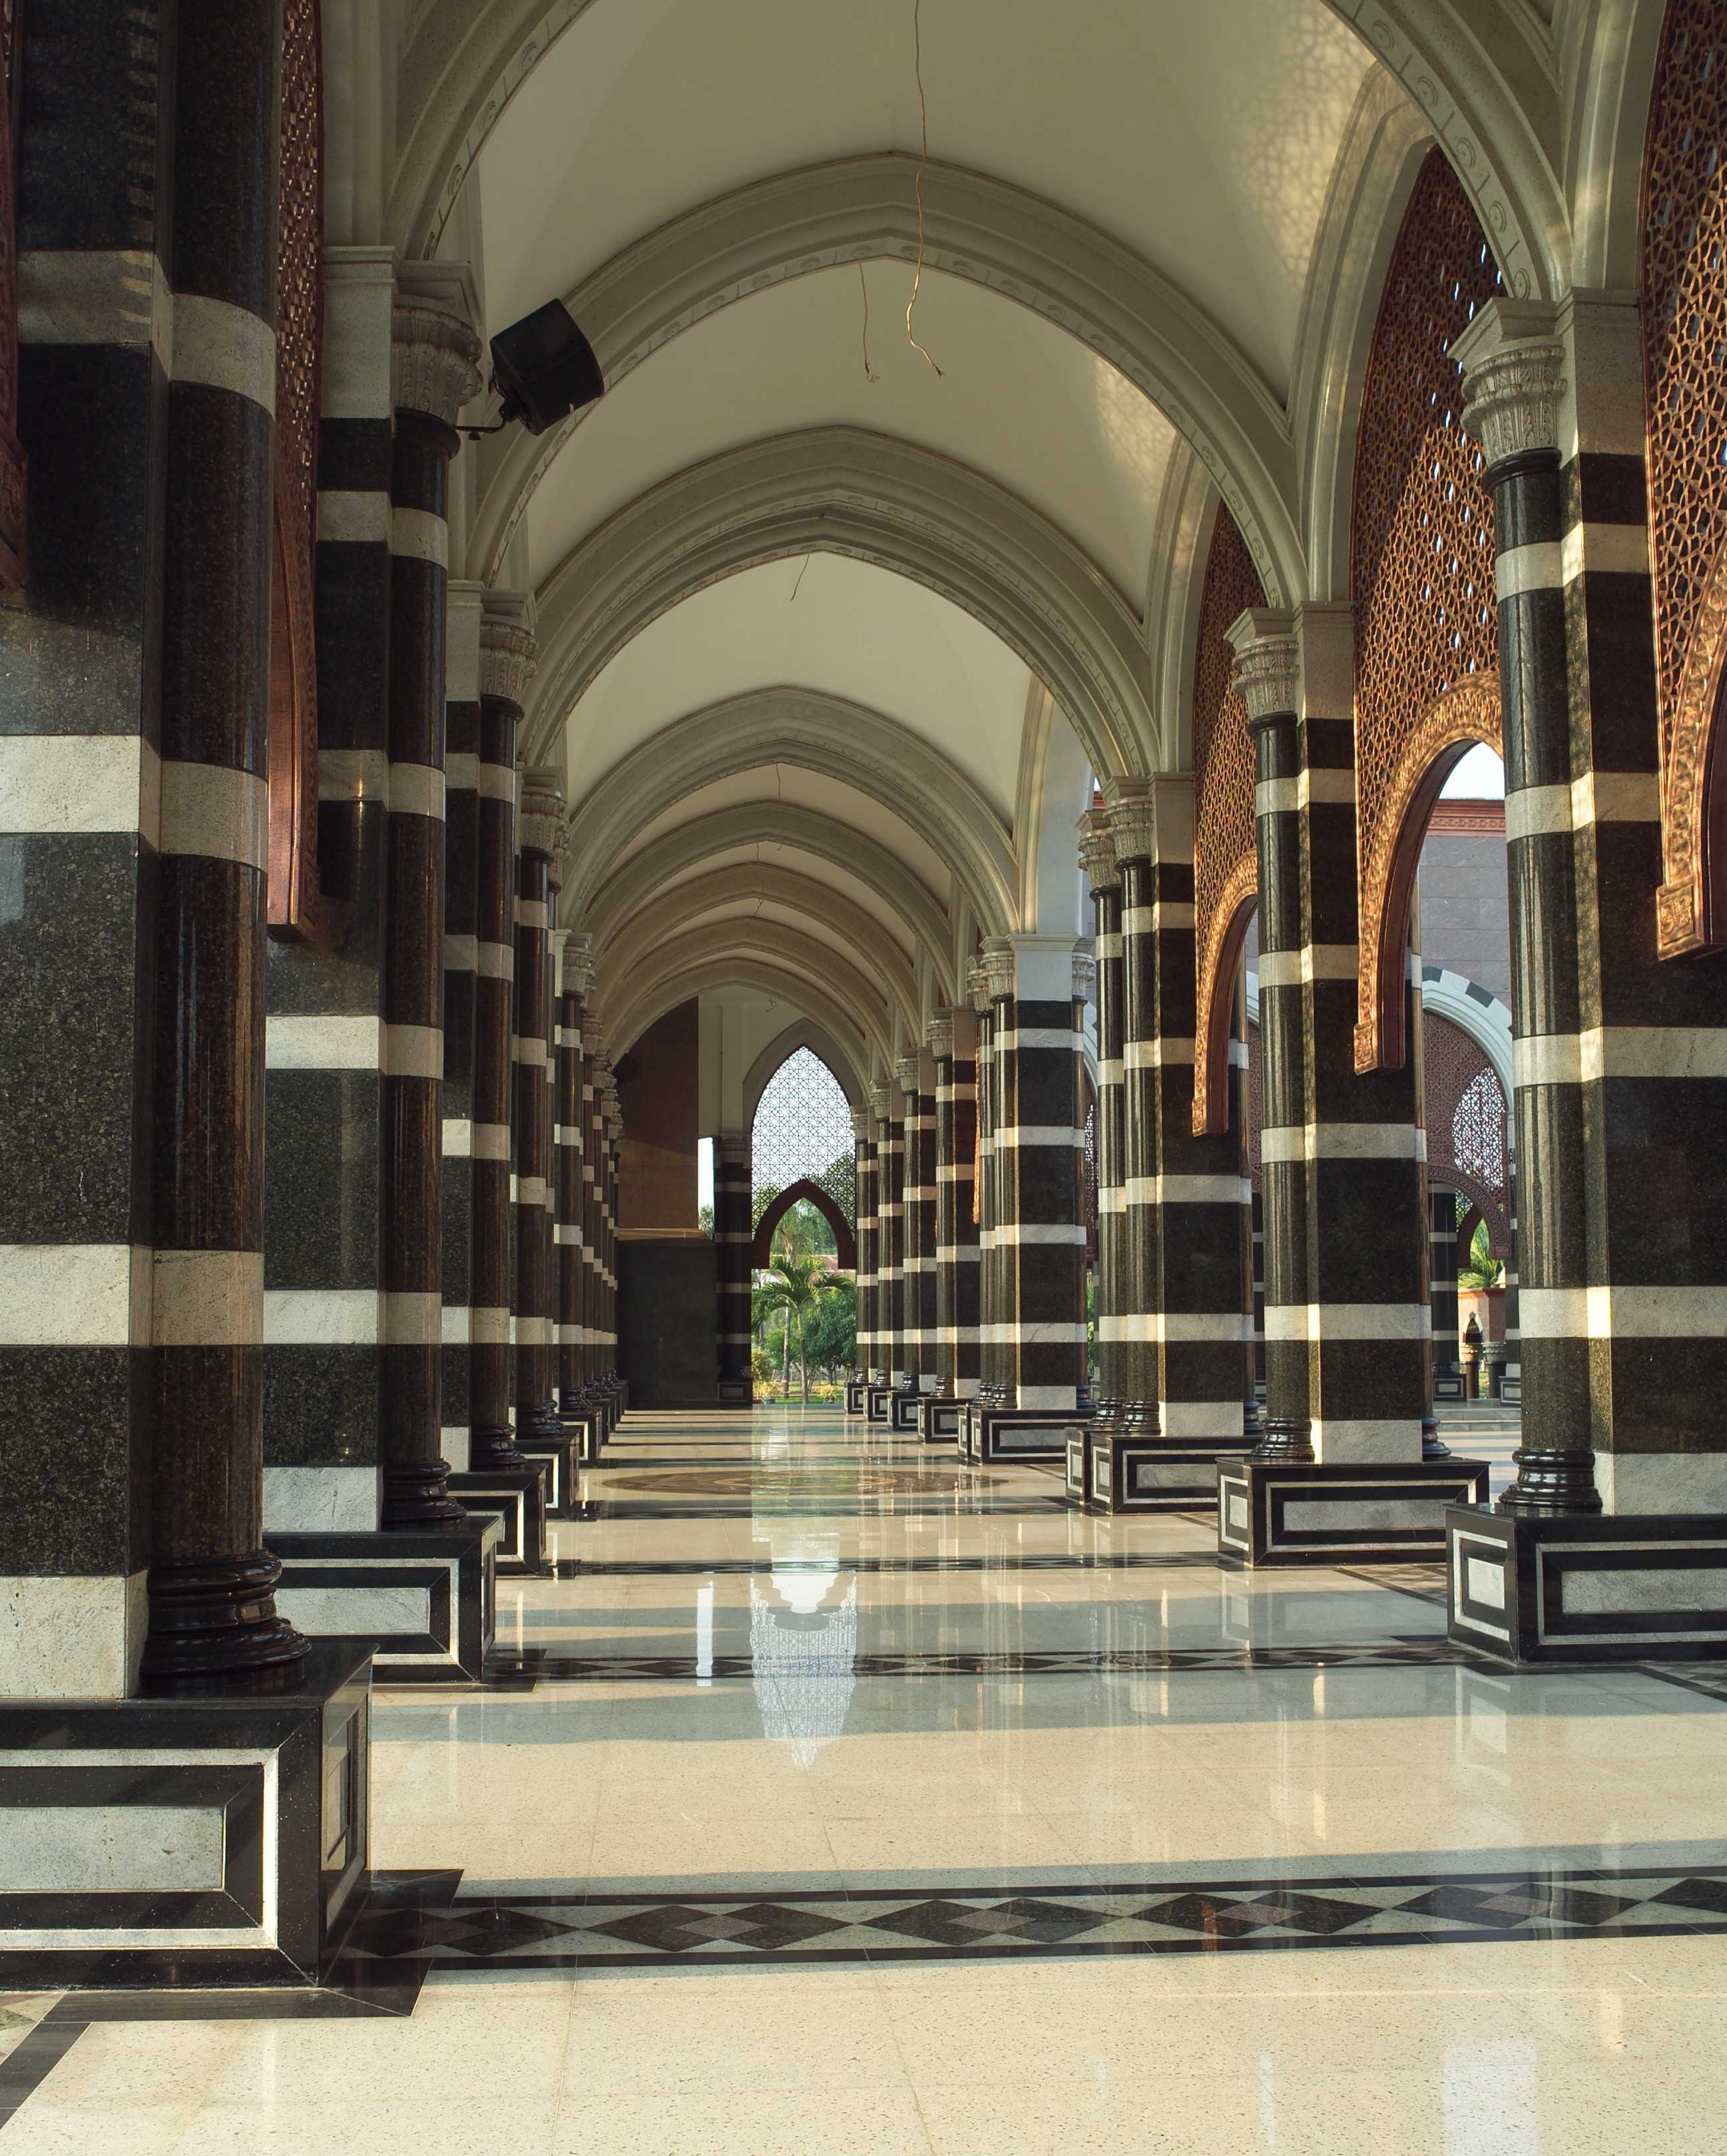 Pt. Garisprada Kubah Emas Mosque Meruyung, Limo, Depok City, West Java, Indonesia Depok Graphic9 Klasik  22018